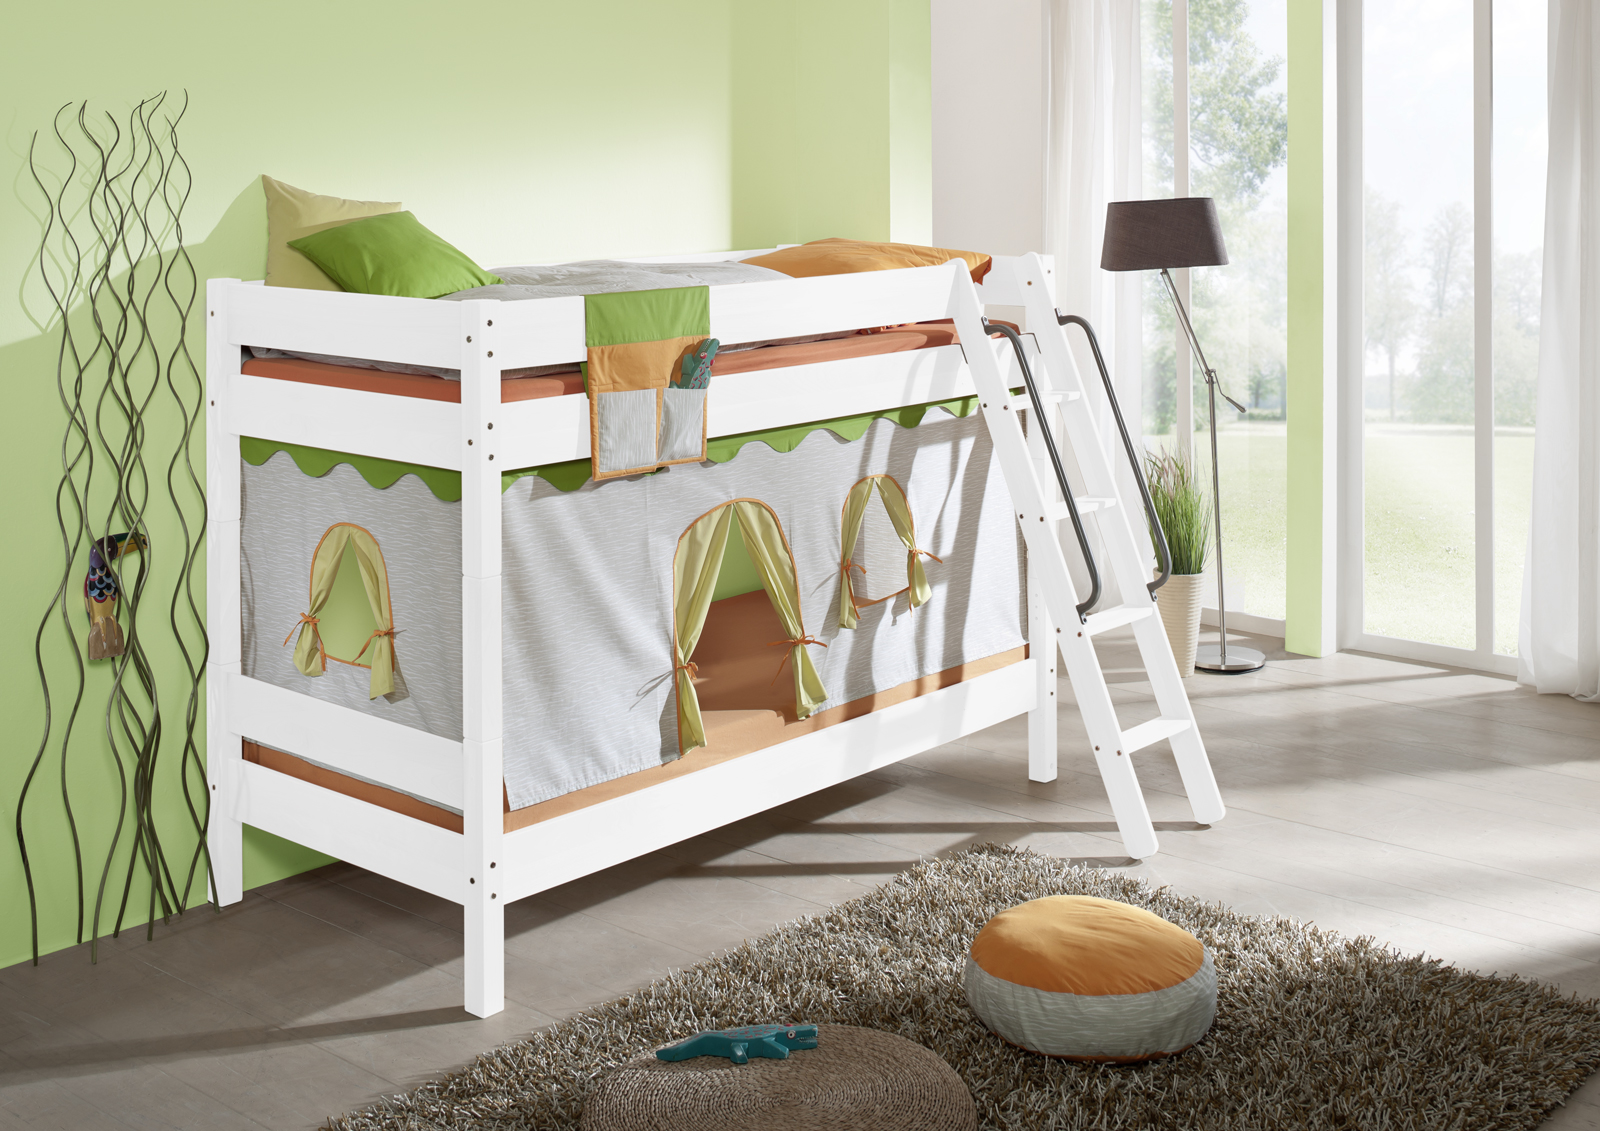 Etagenbett Kinder Buche Massiv : Sam kinder etagenbett ritter i weiß gerade massiv buche